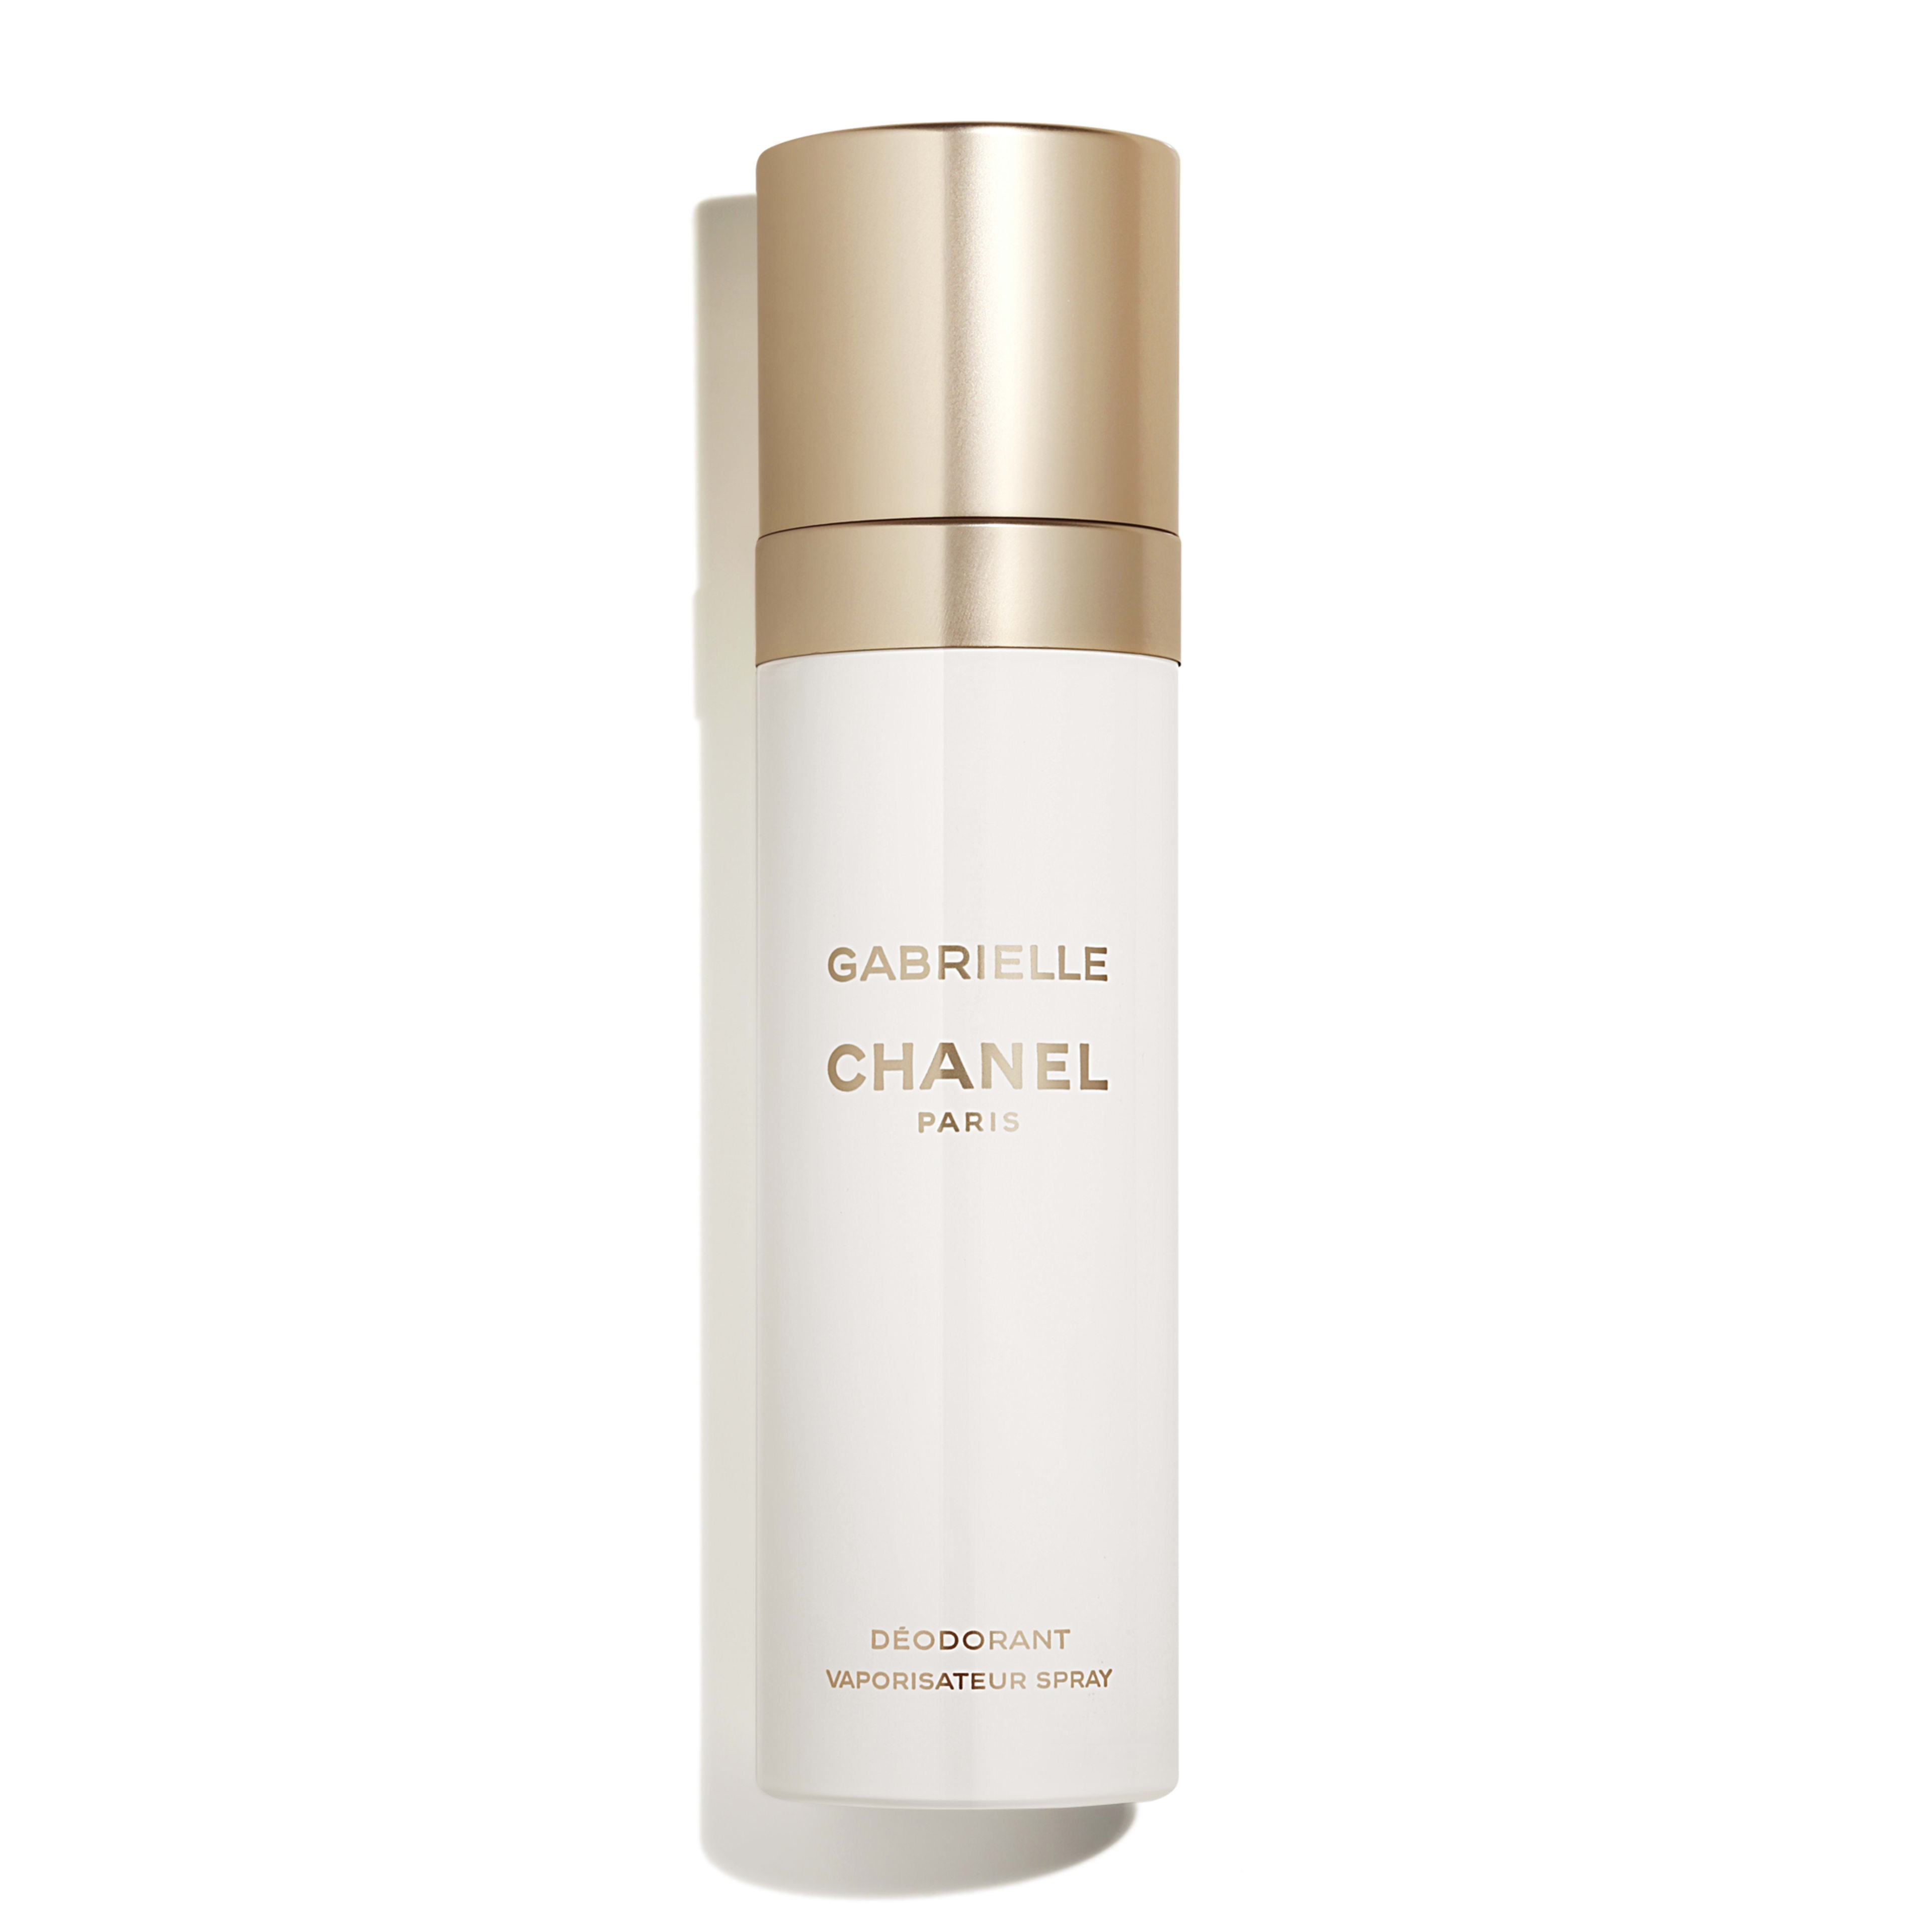 Chanel Gabrielle Deodorant pro ženy